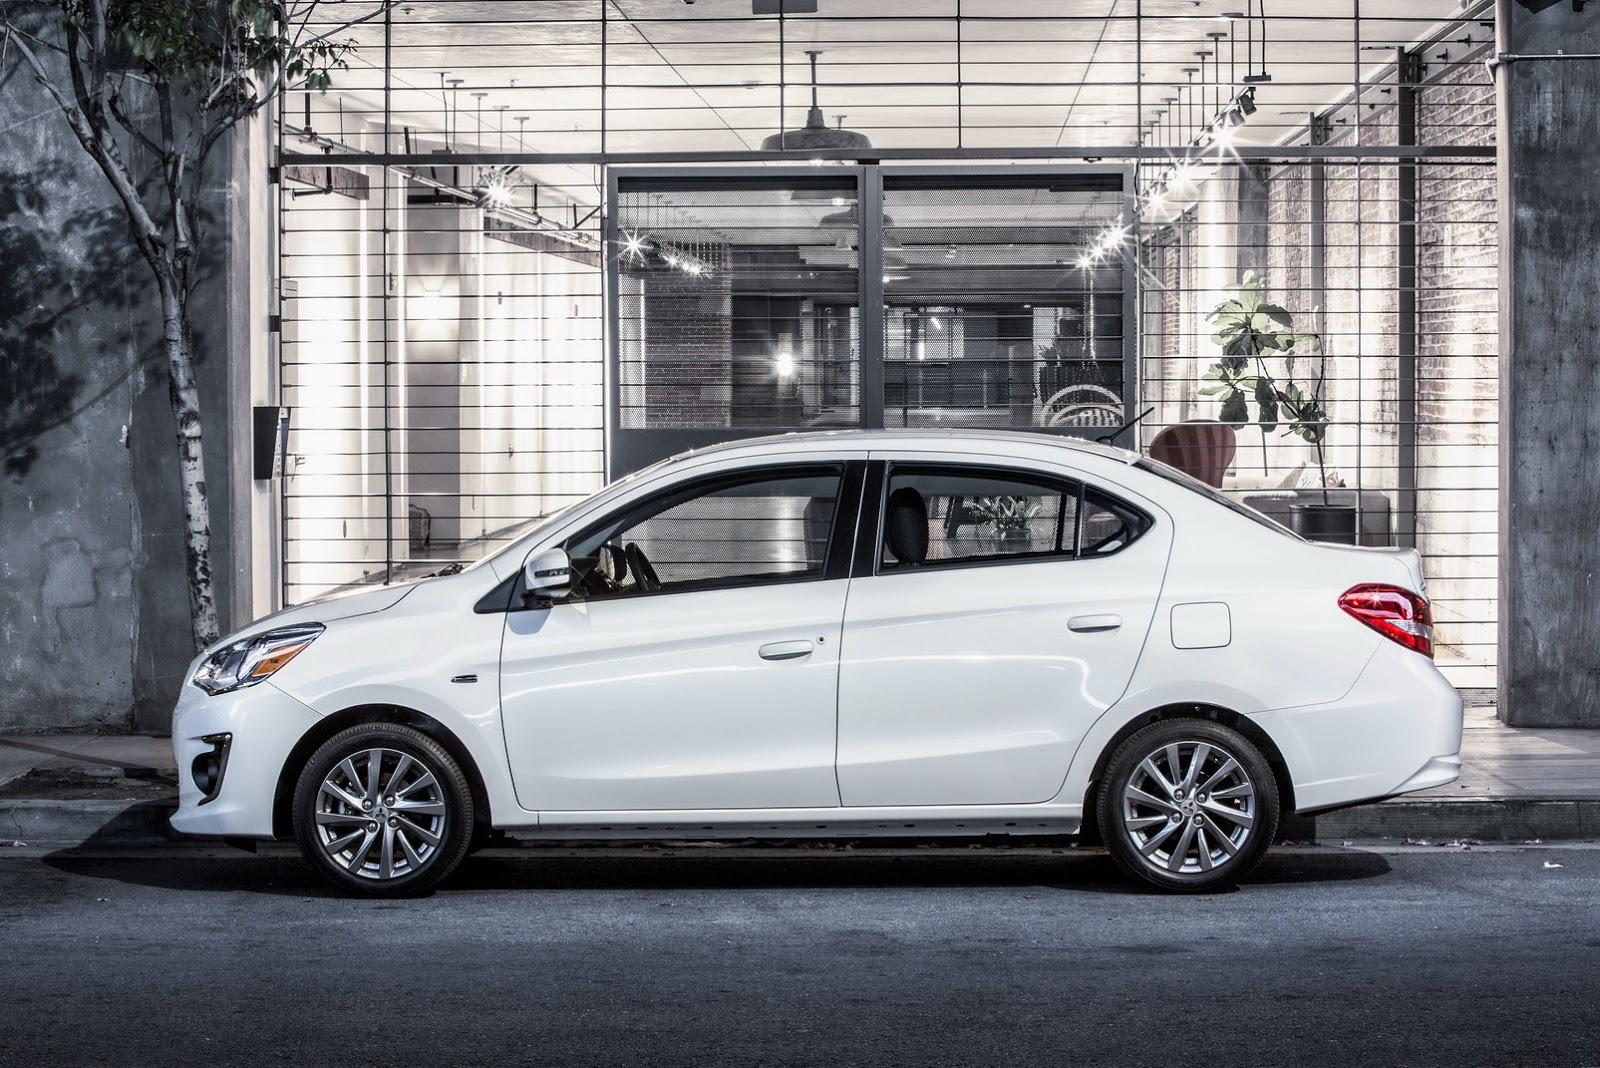 2017 Mitsubishi Lancer | 2017 - 2018 Cars Reviews